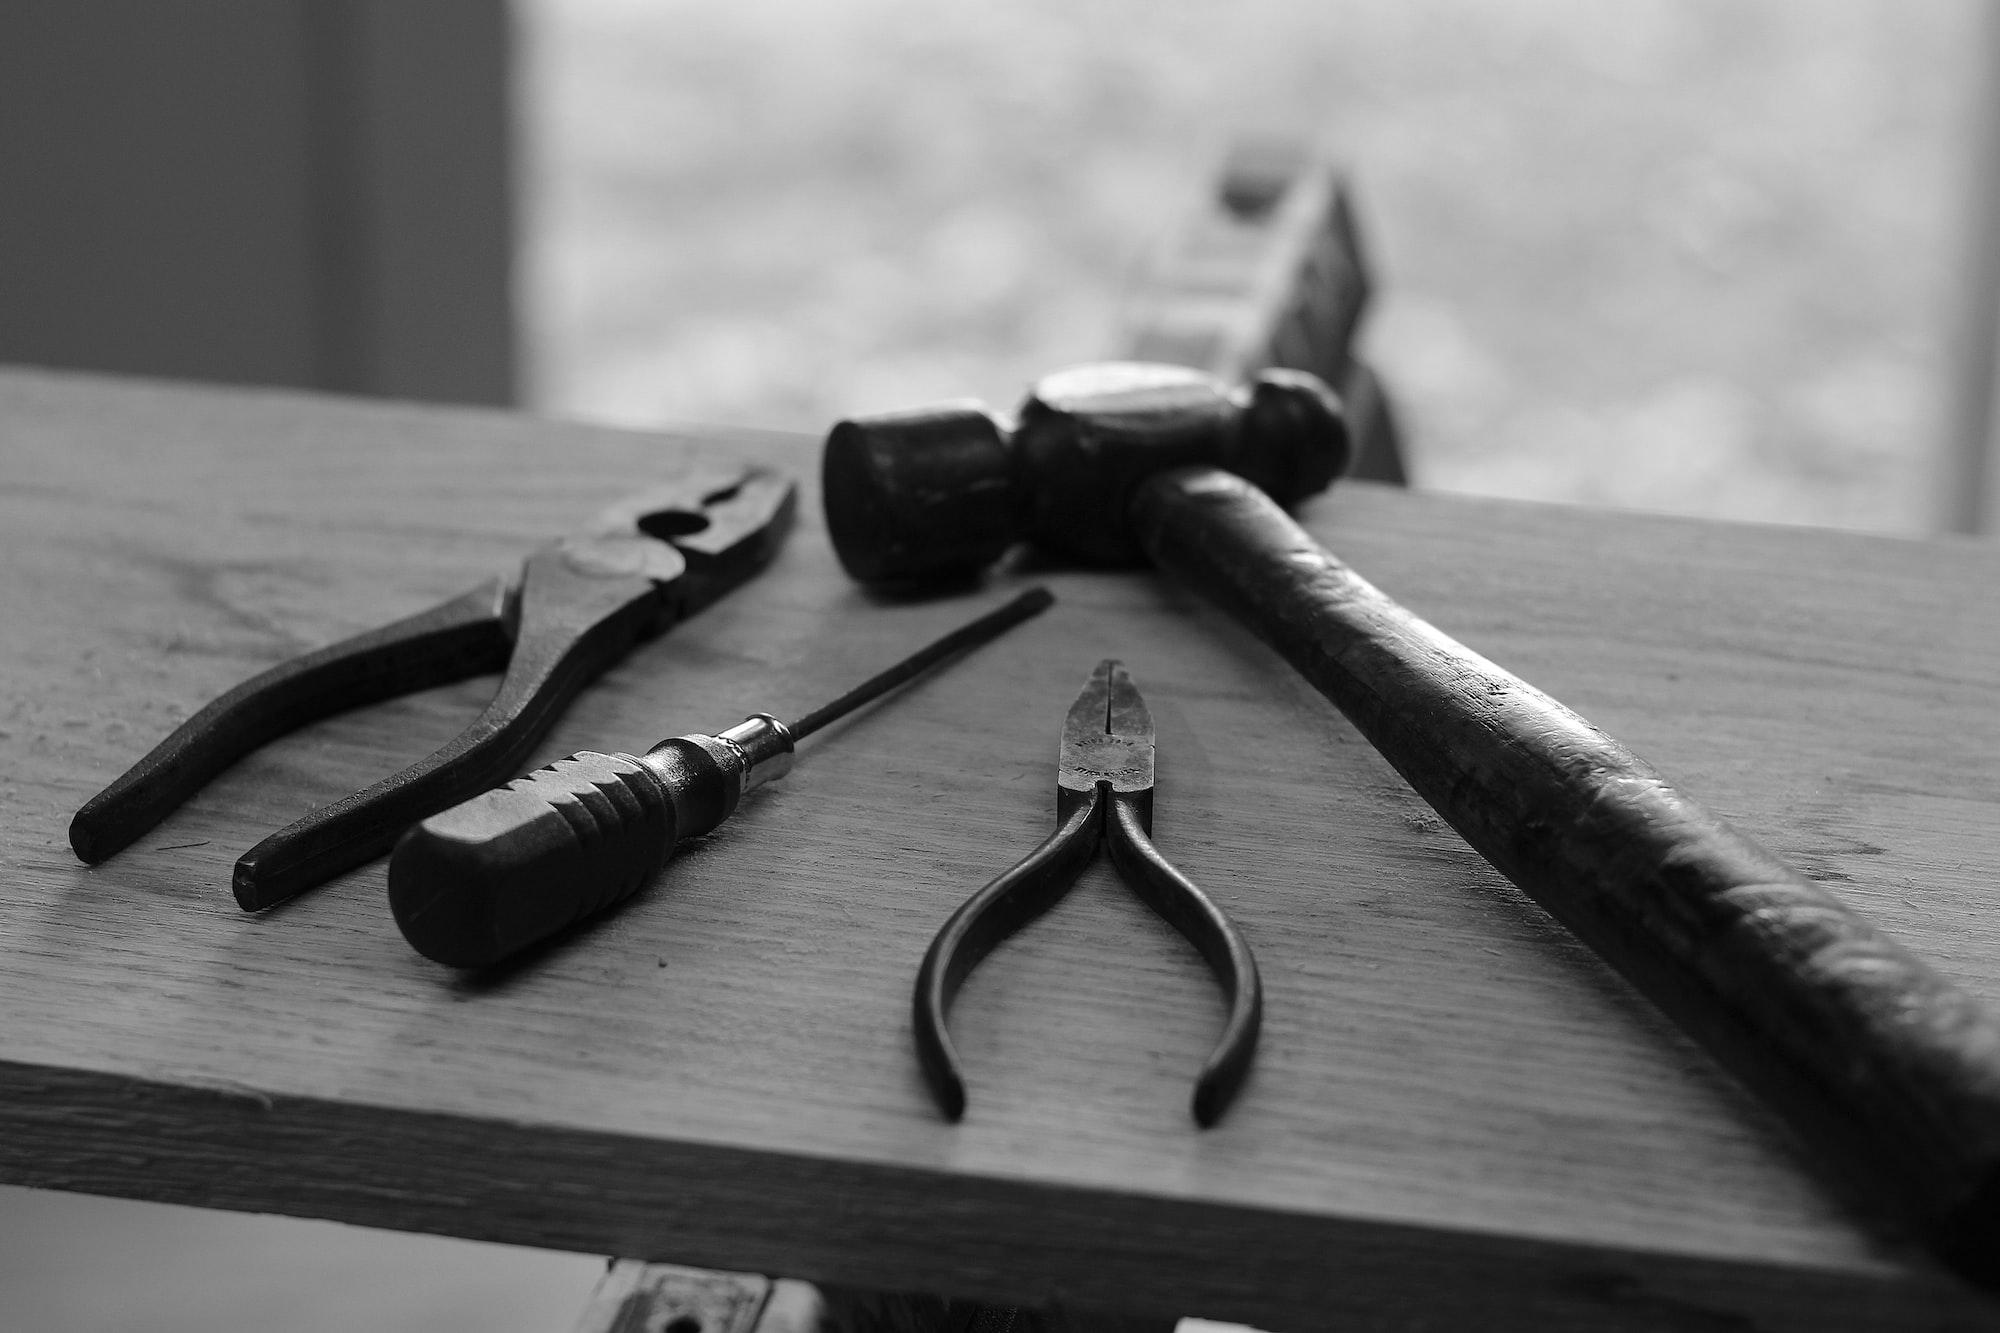 New year, new organizing tools